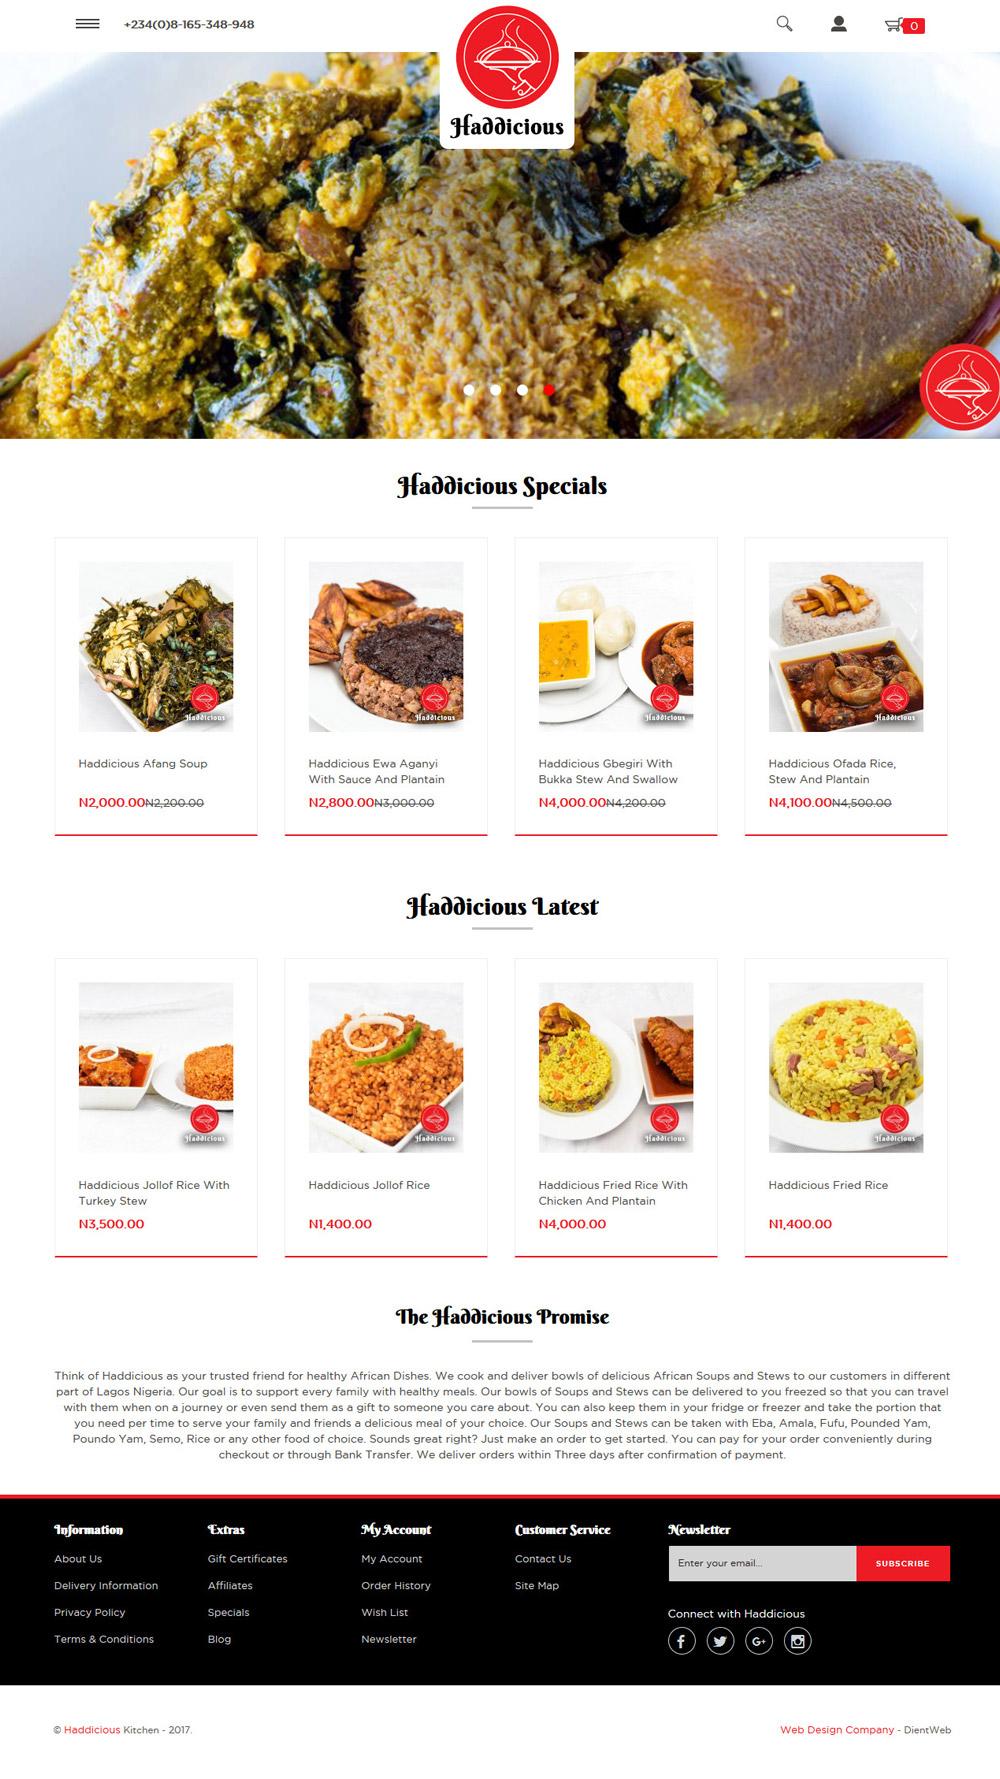 ecommerce website design for Haddicious by DientWeb best ecommerce developer in lagos nigeria